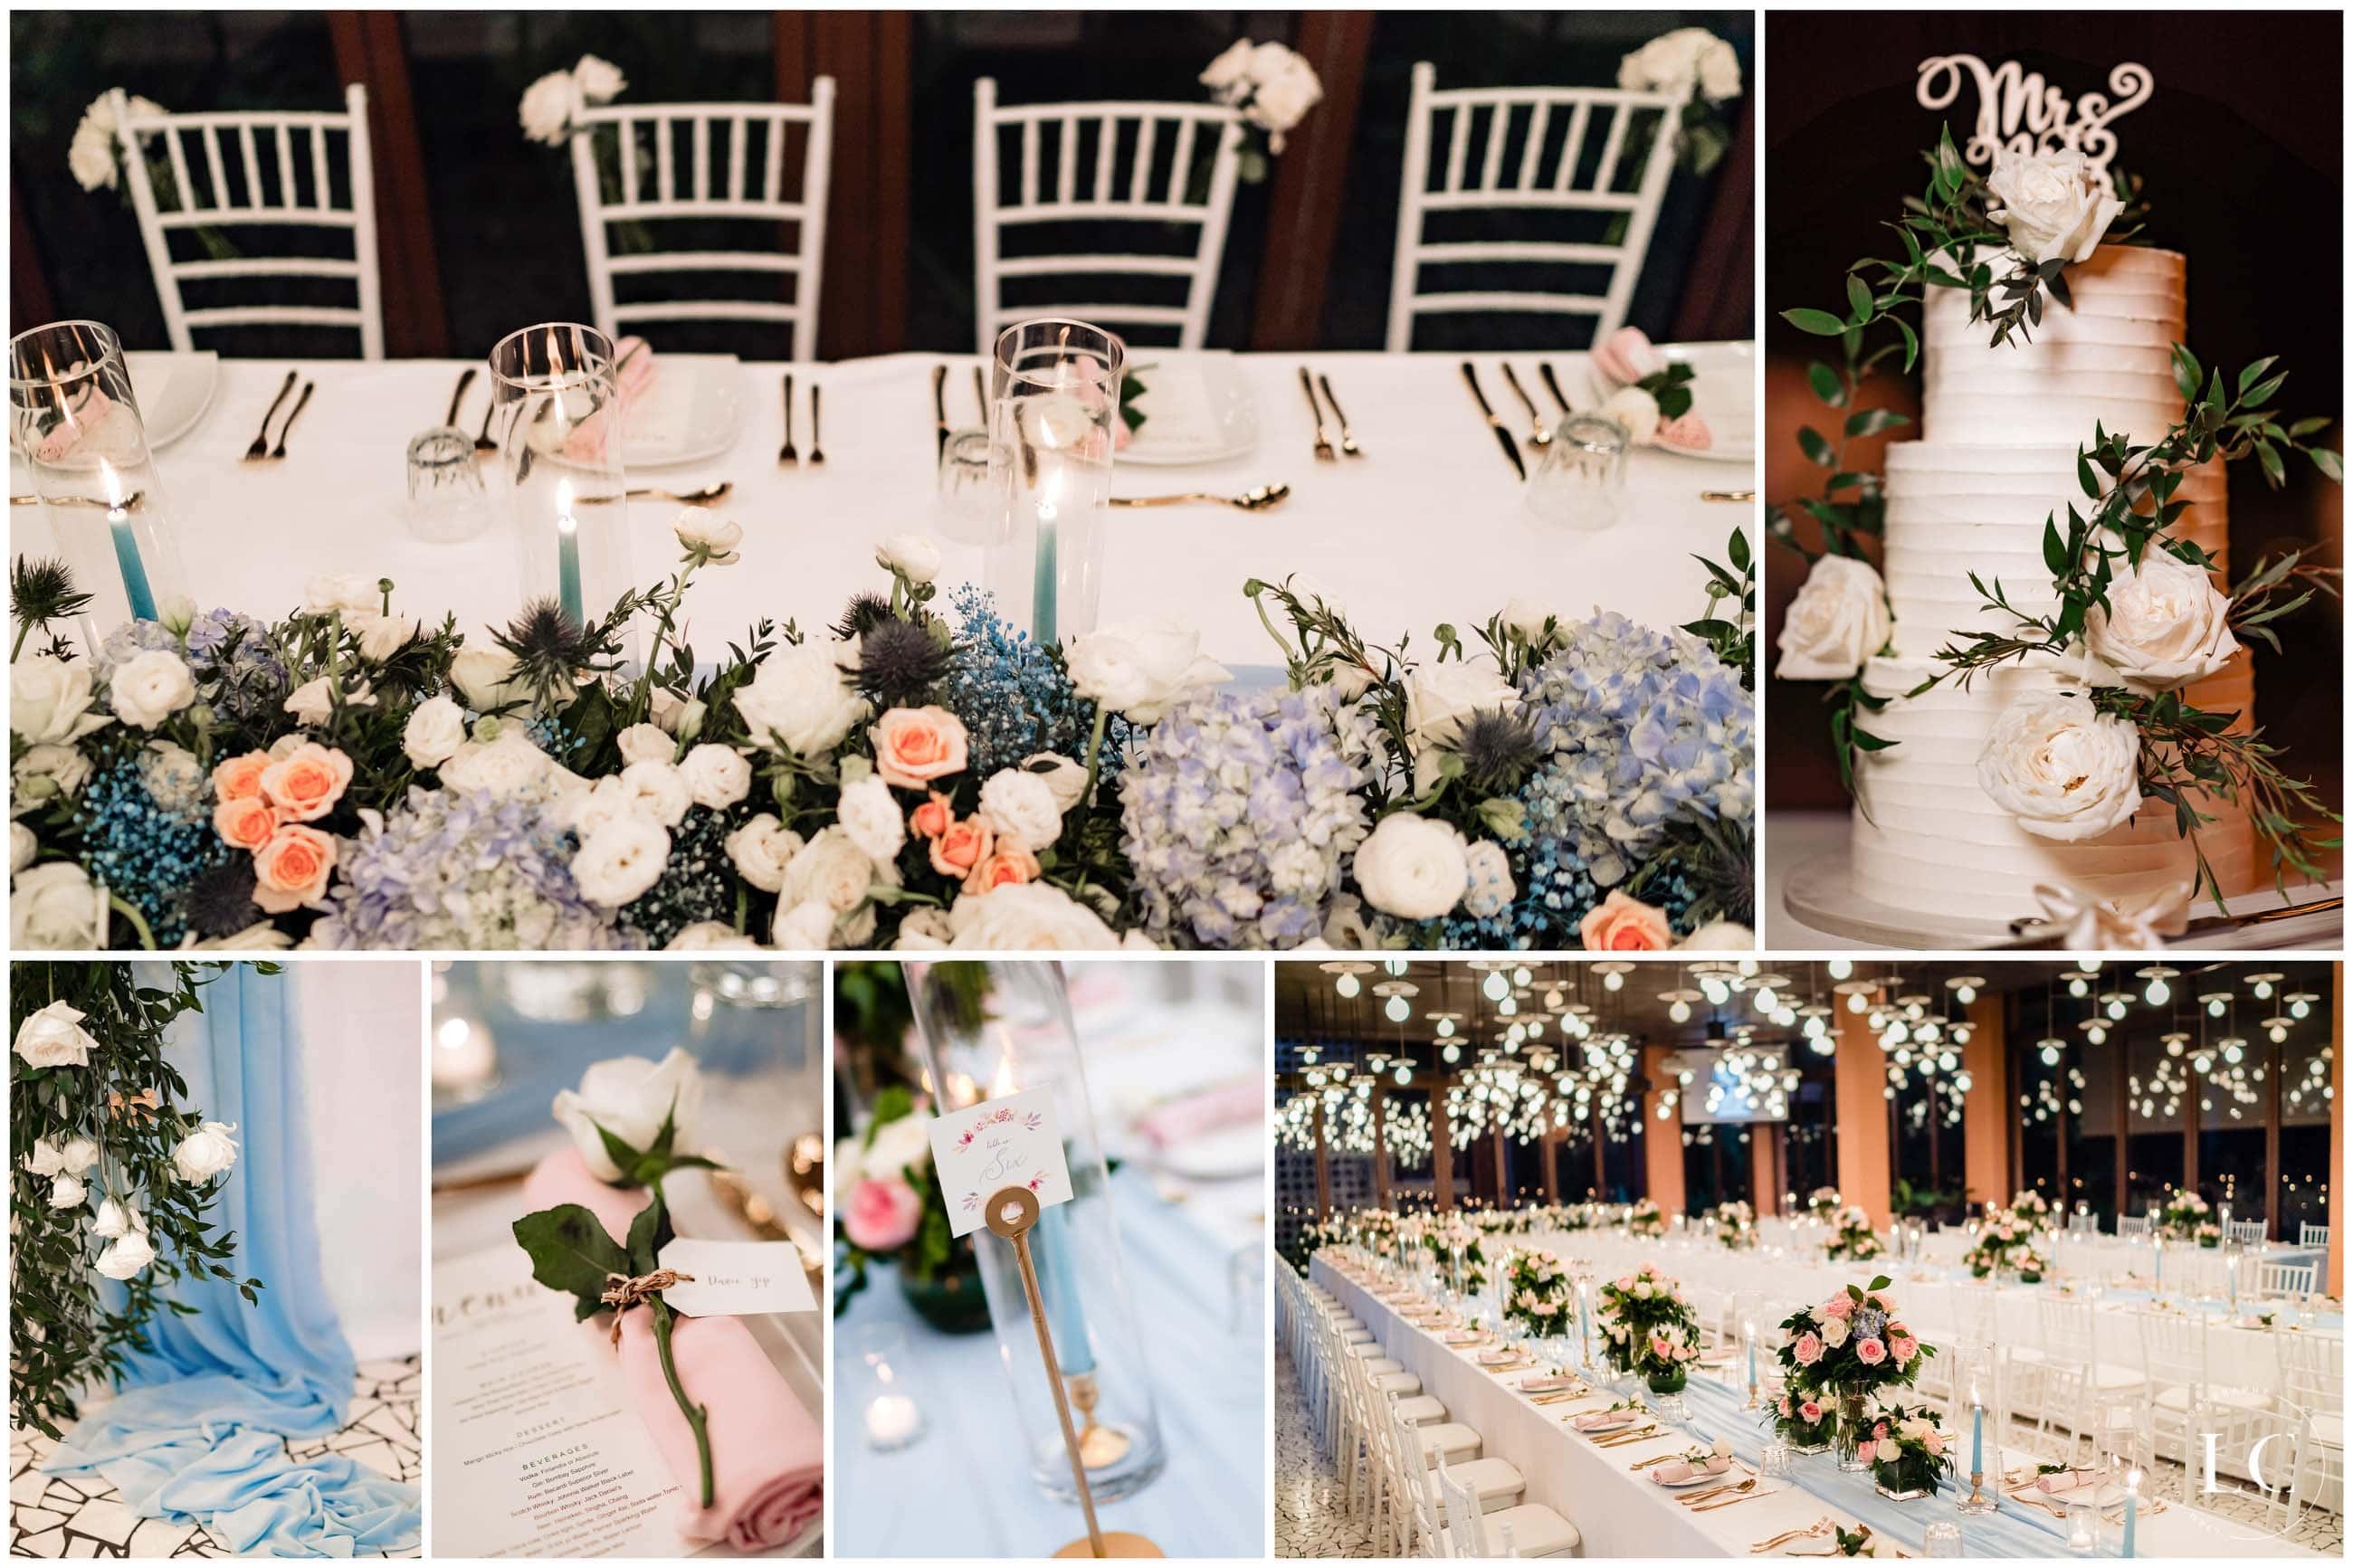 Collage of wedding decor